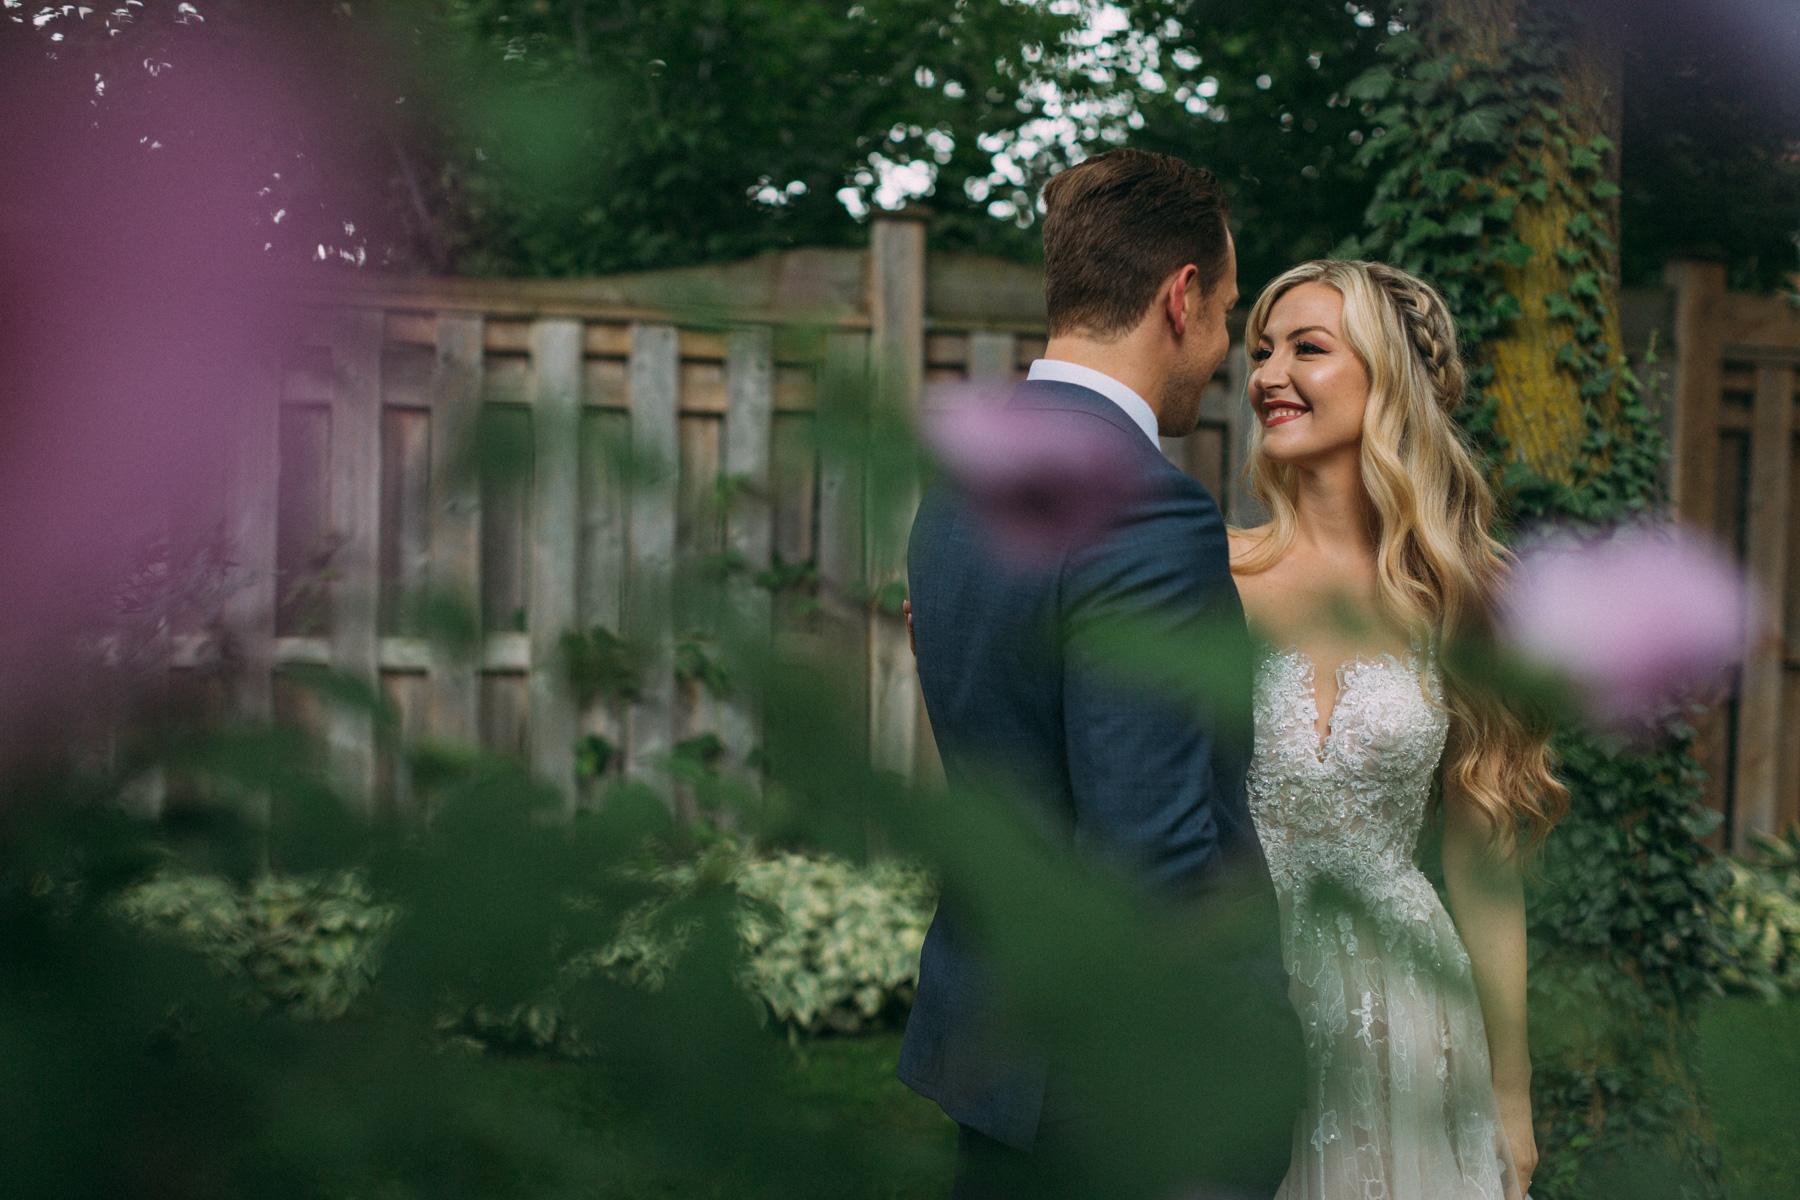 La-Maquette-wedding-by-Toronto-modern-wedding-photographer-Sam-Wong_15.jpg